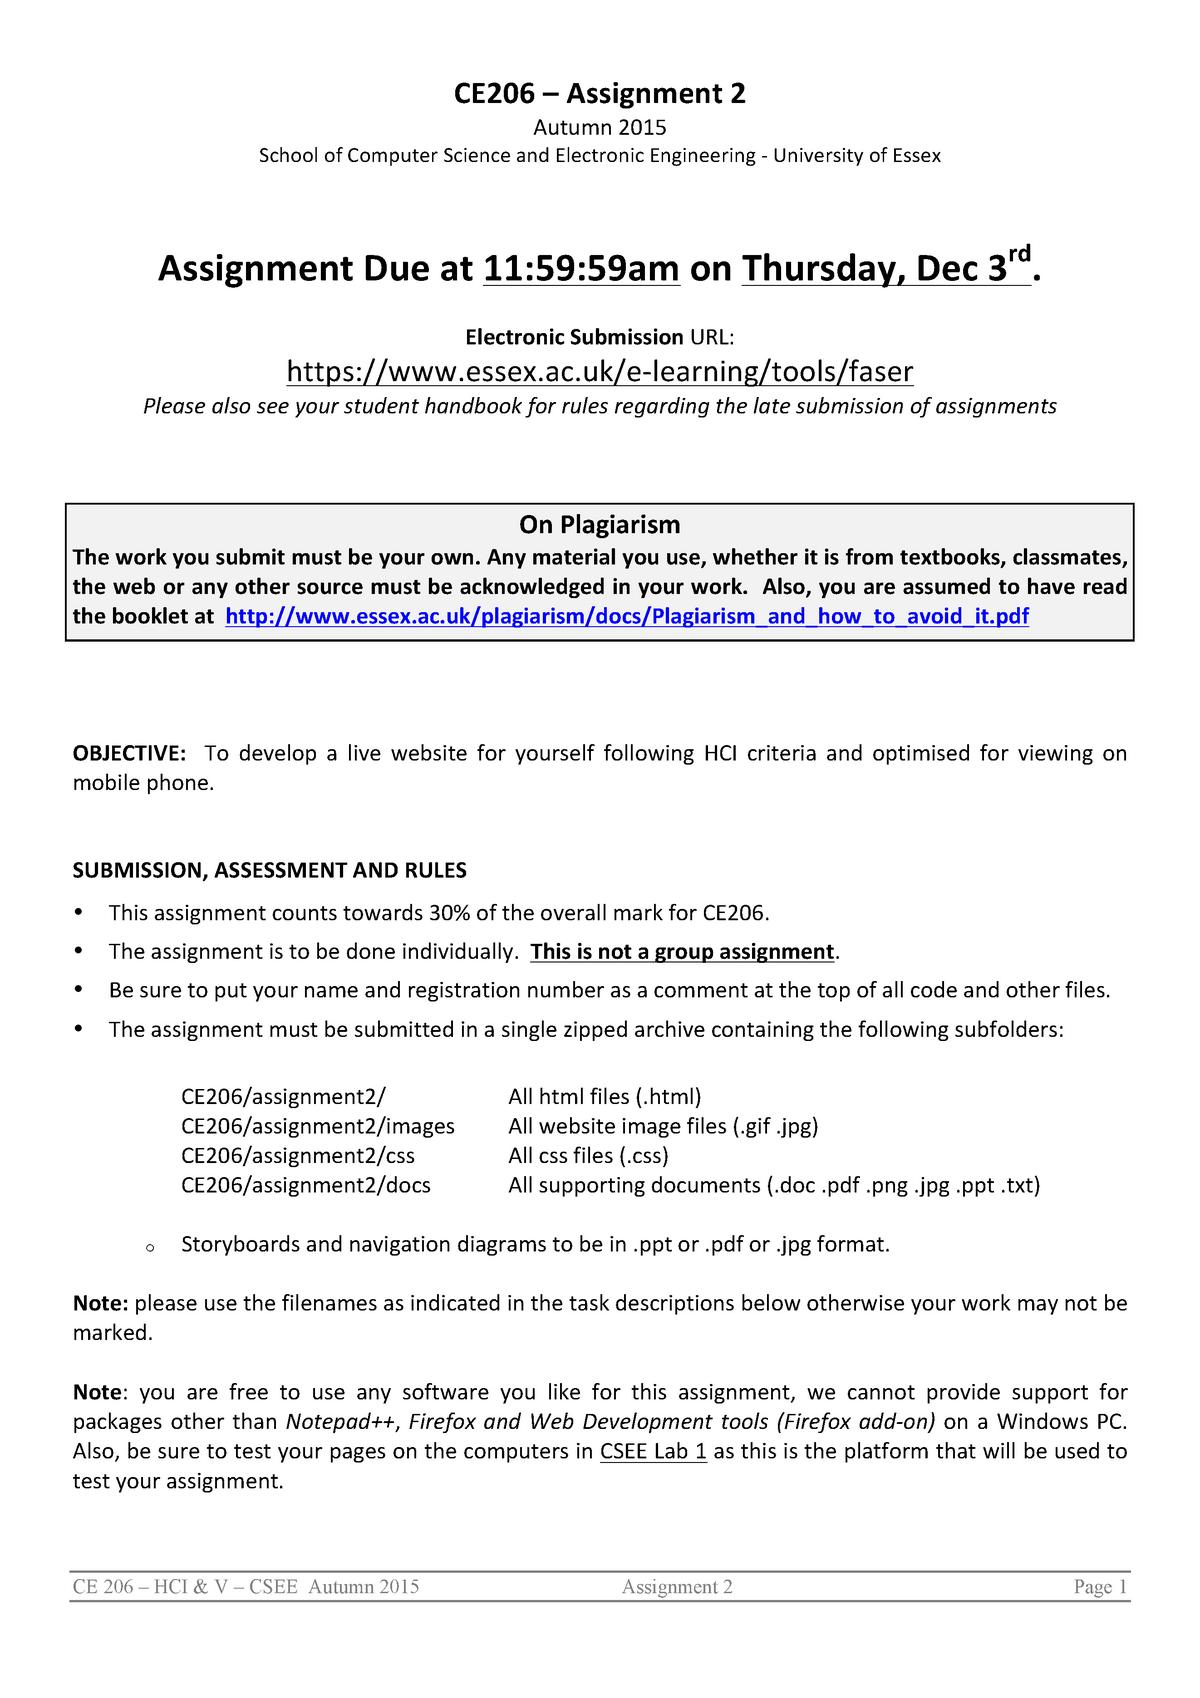 CE206 Assignment 2 - CE206-5-AU-CO: Human Computer